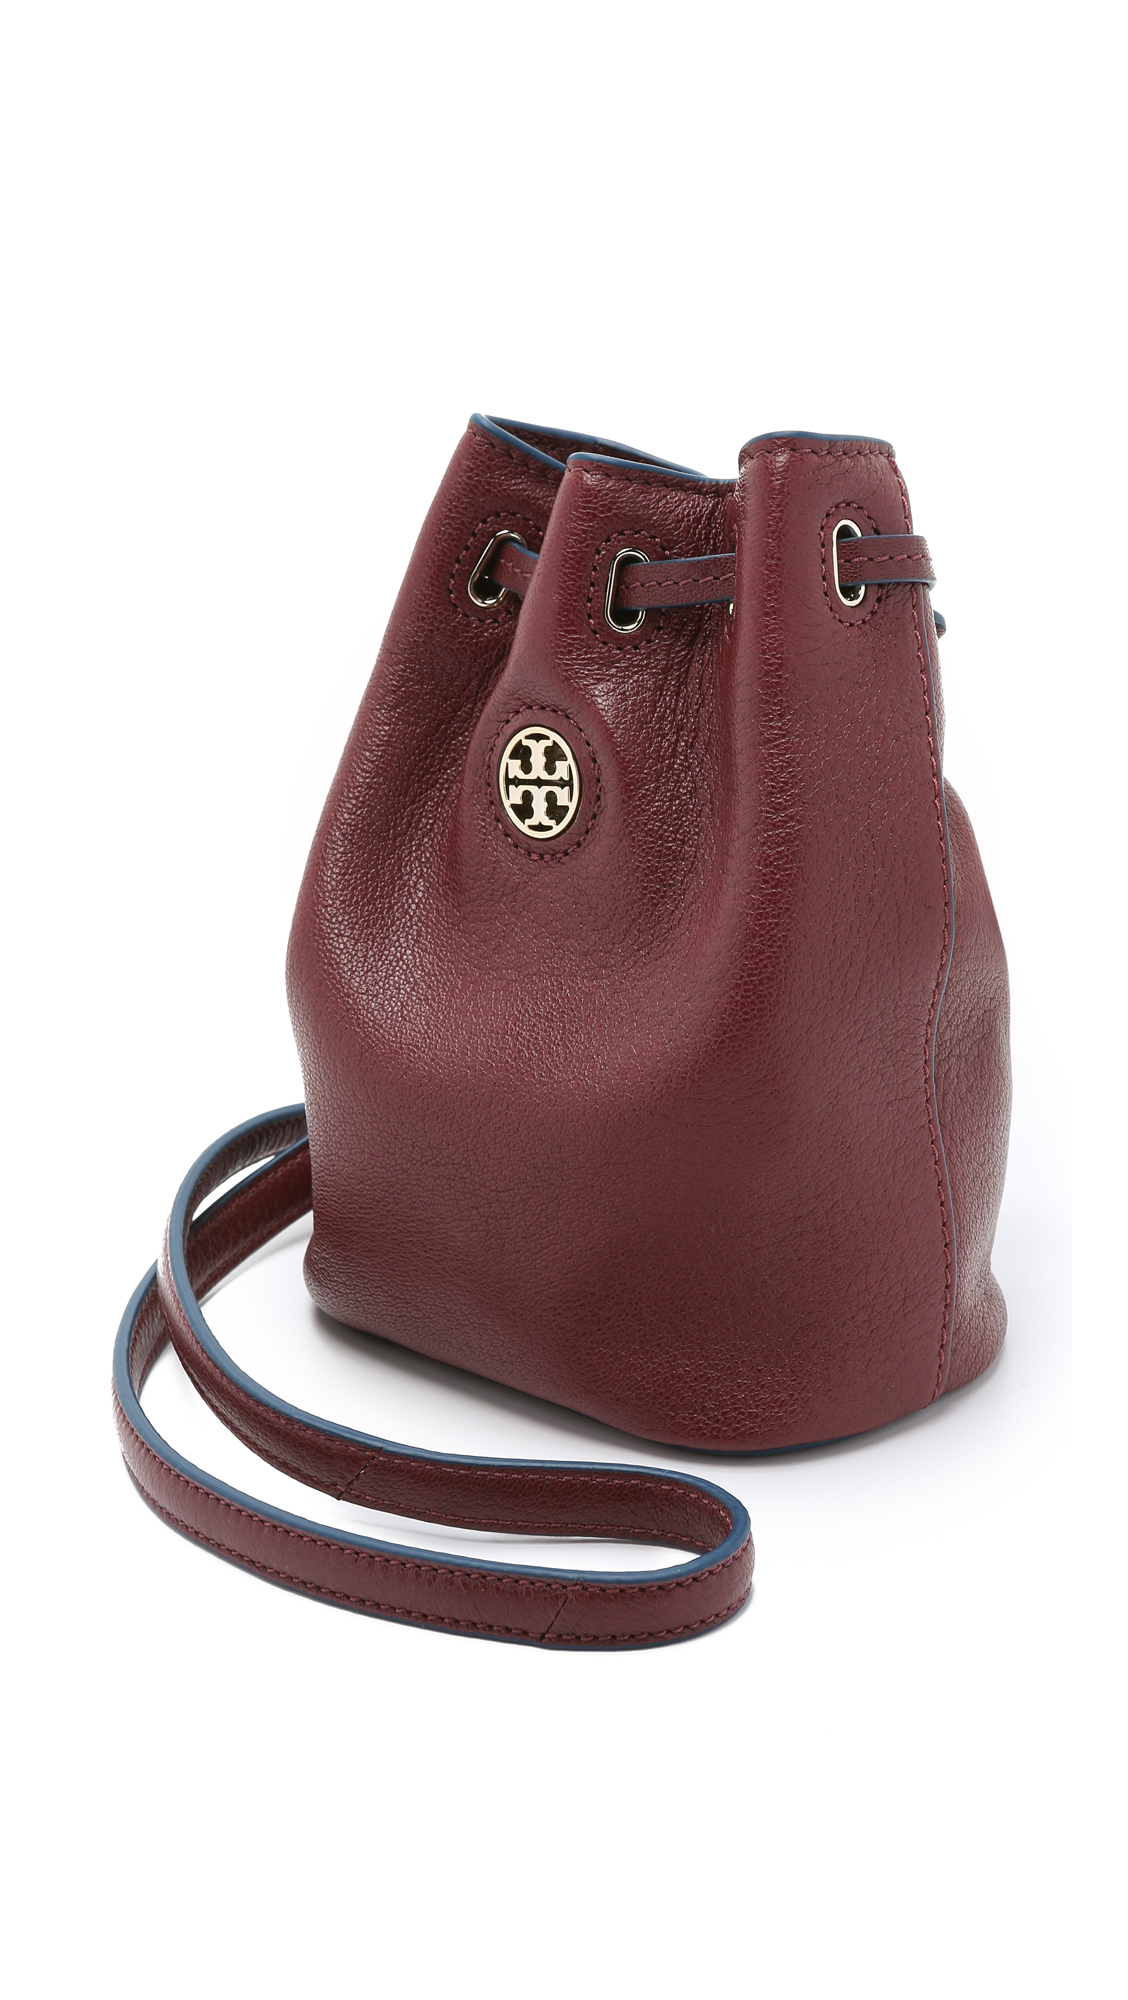 Tory Burch Brody Mini Bucket Bag Deep Berry In Red Lyst